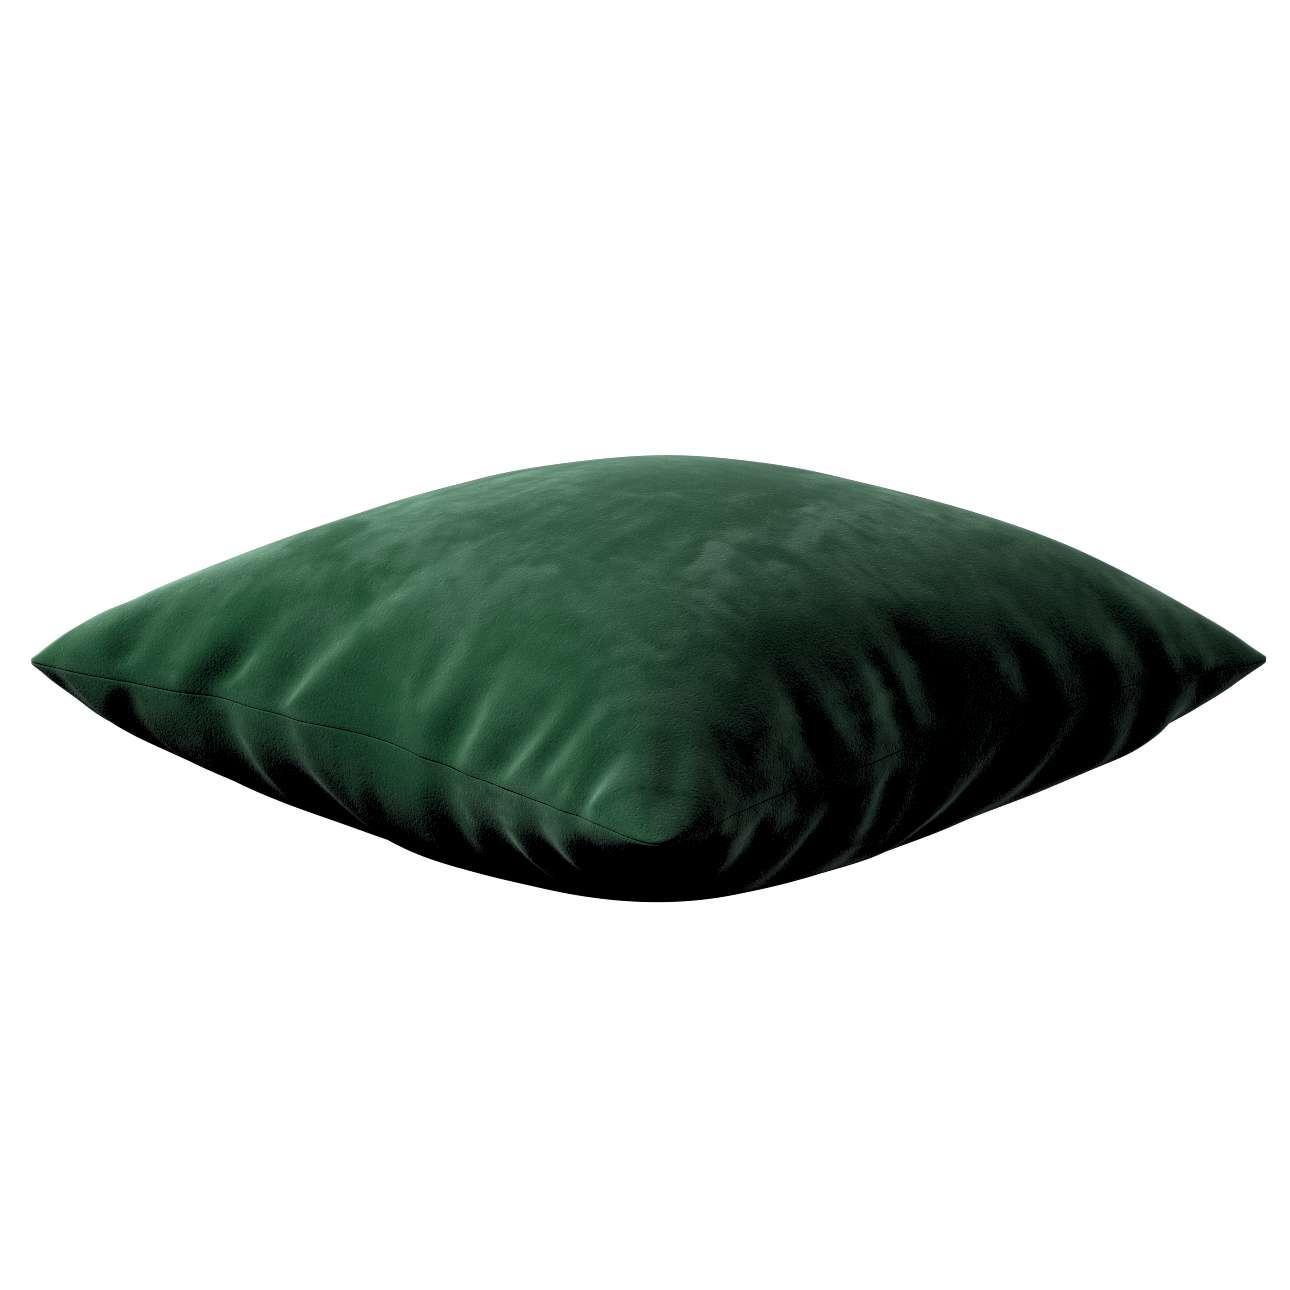 Kinga - potah na polštář jednoduchý v kolekci Velvet, látka: 704-13